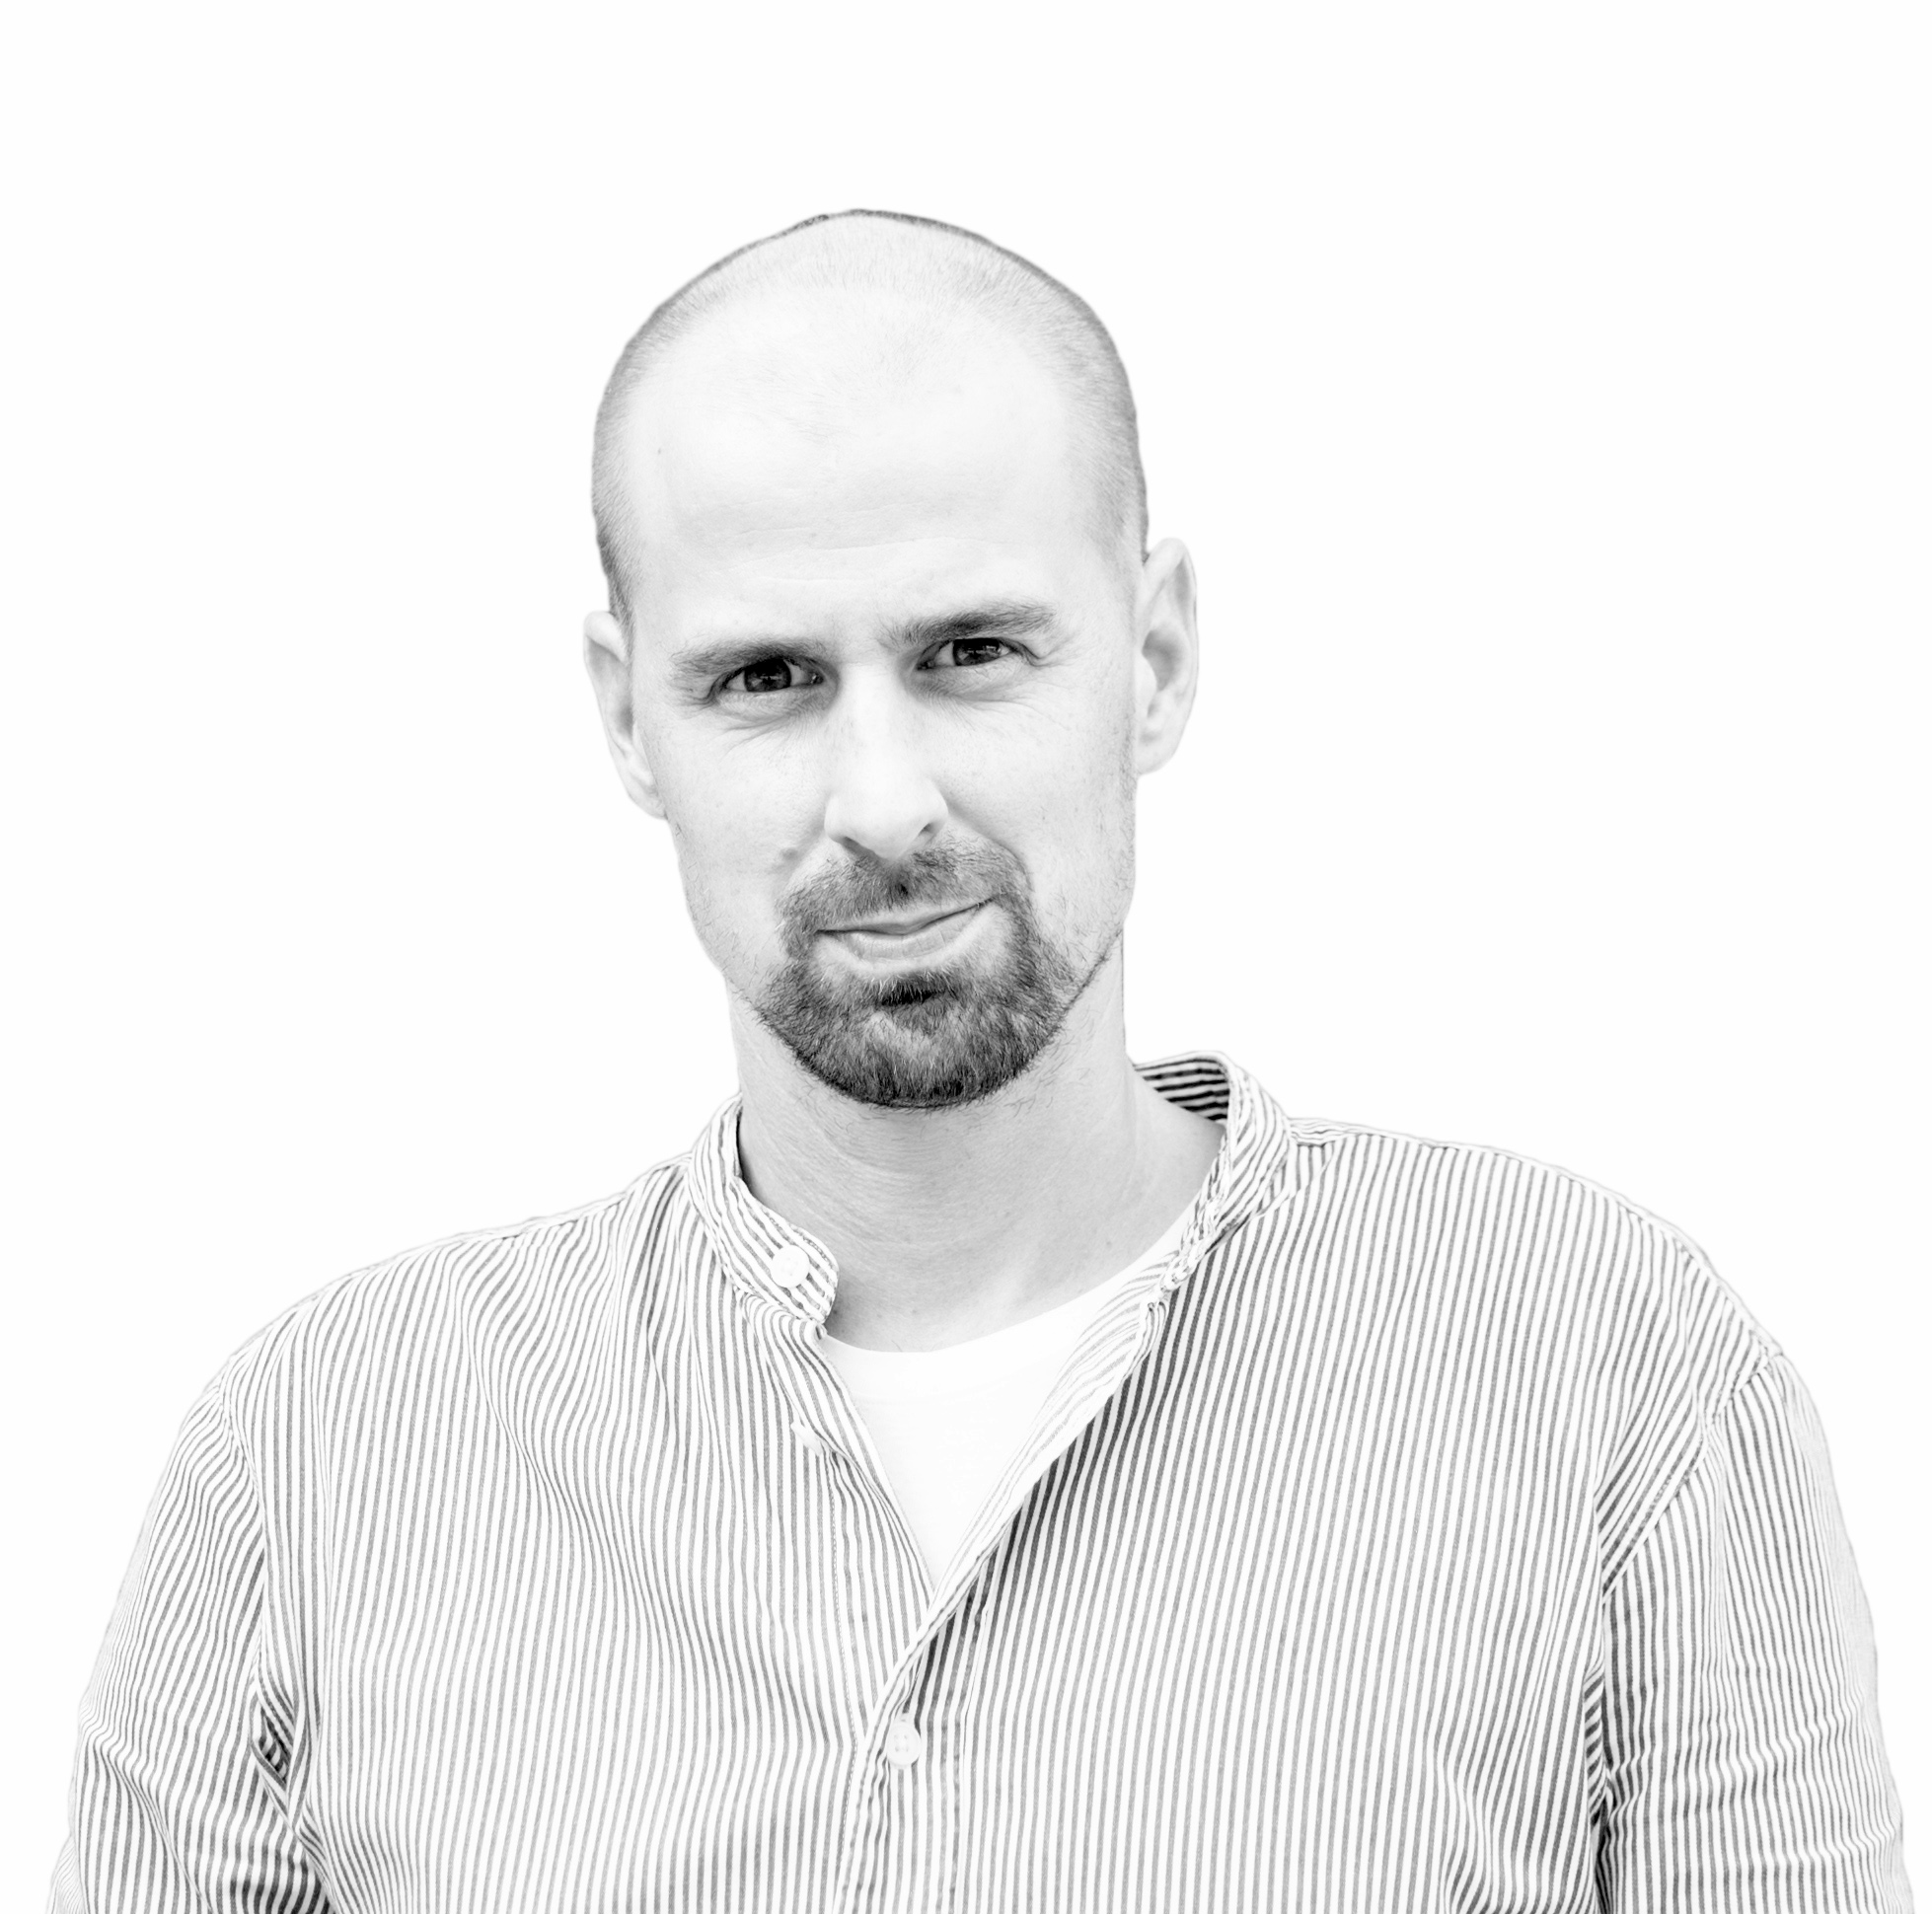 Michal Šenk